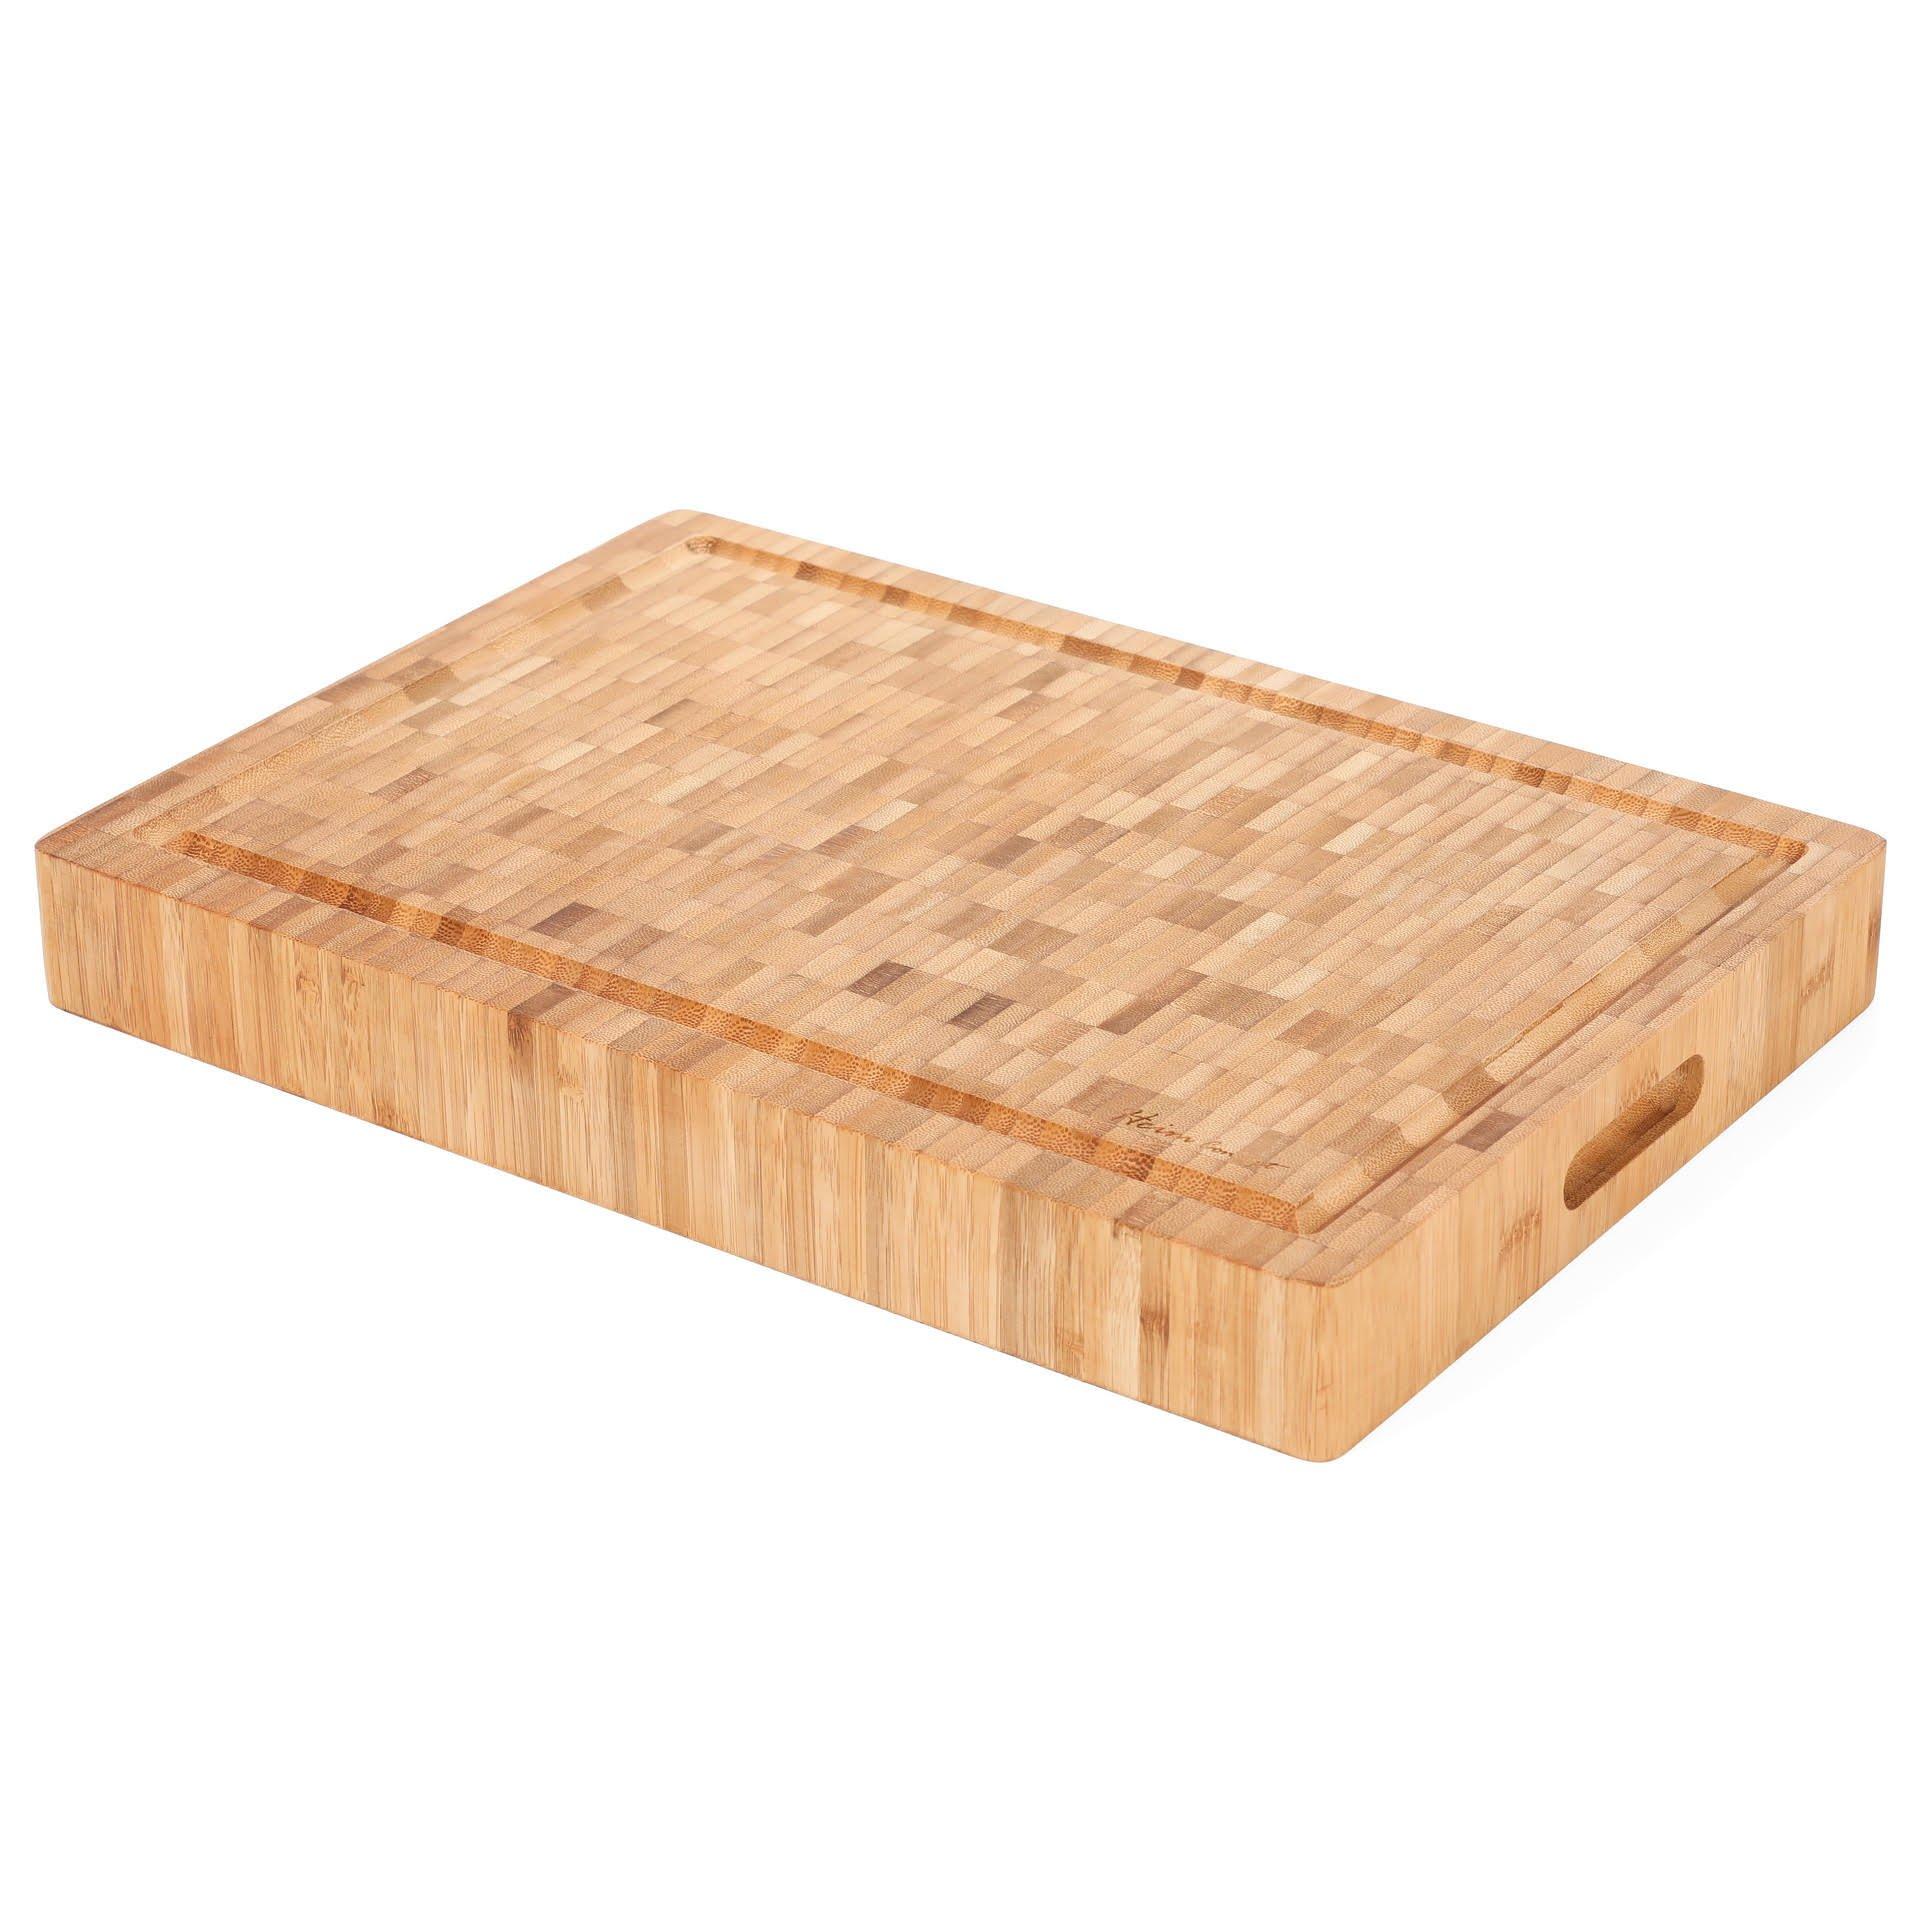 Heim Concept 1PC Premium Large [17'' x 12'' x 2''] Organic Bamboo Butcher Block Chopping Board Cutting Board, Professional Grade by Heim Concept (Image #1)